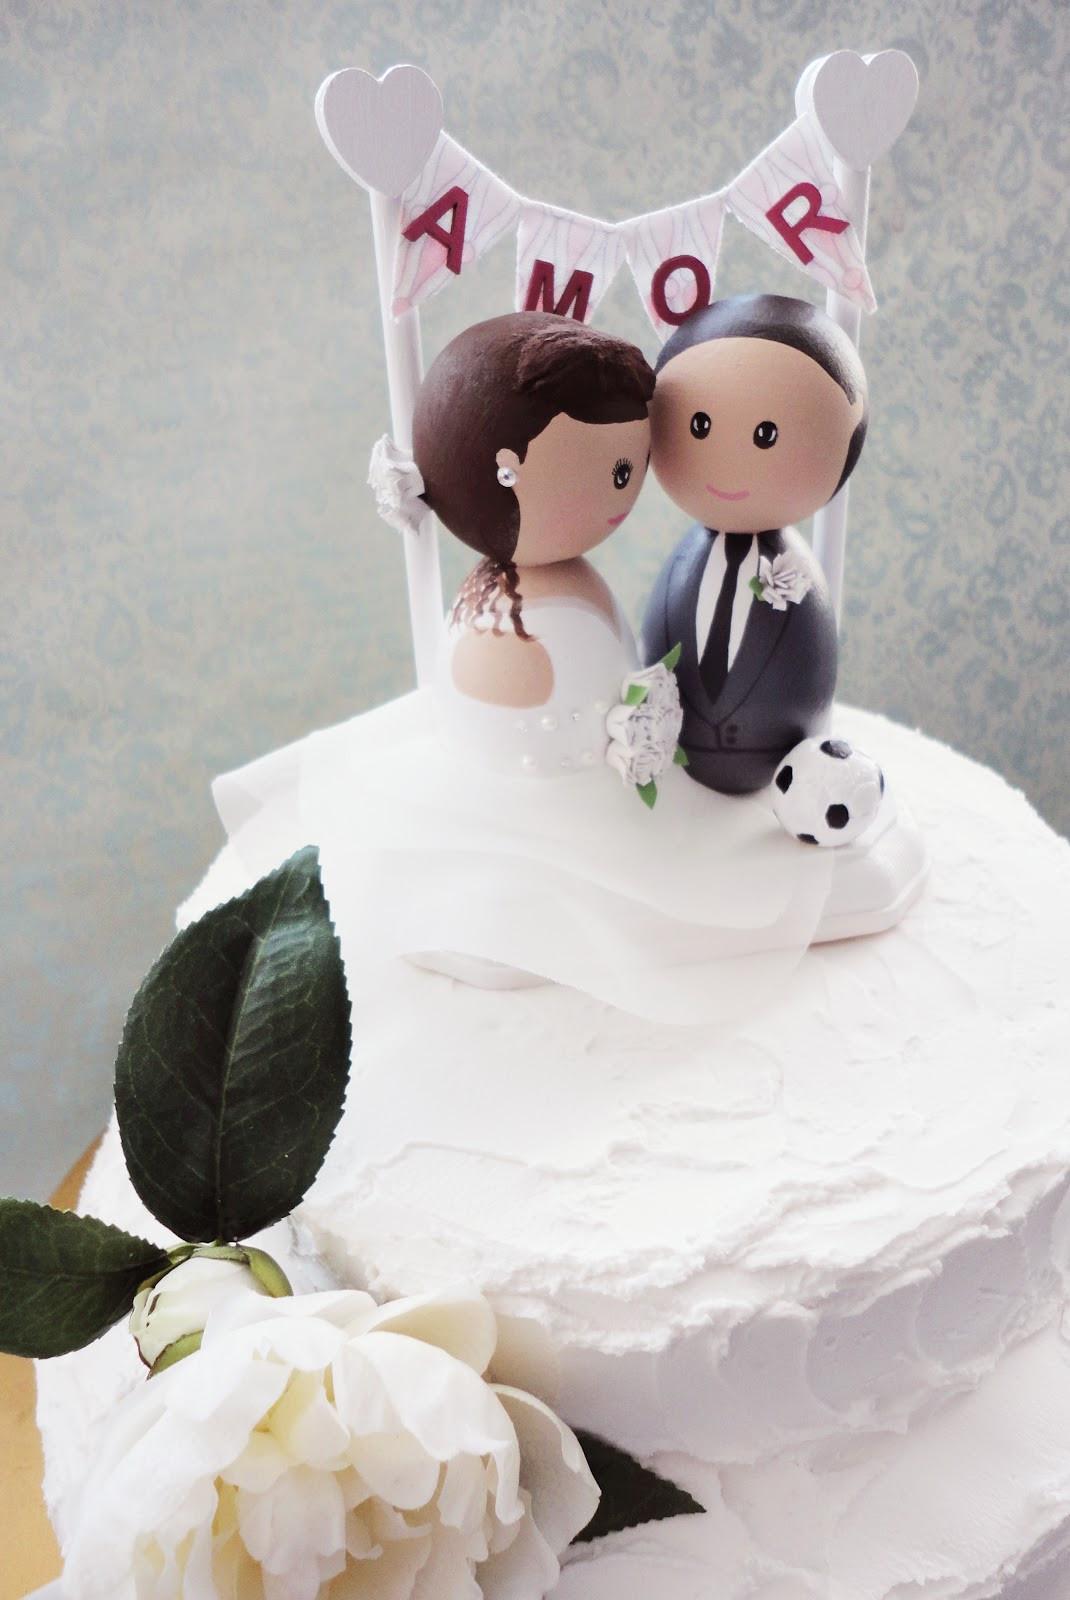 Soccer Wedding Cakes  DSMeeBee Soccer Wedding Cake Topper with a Custom AMOR